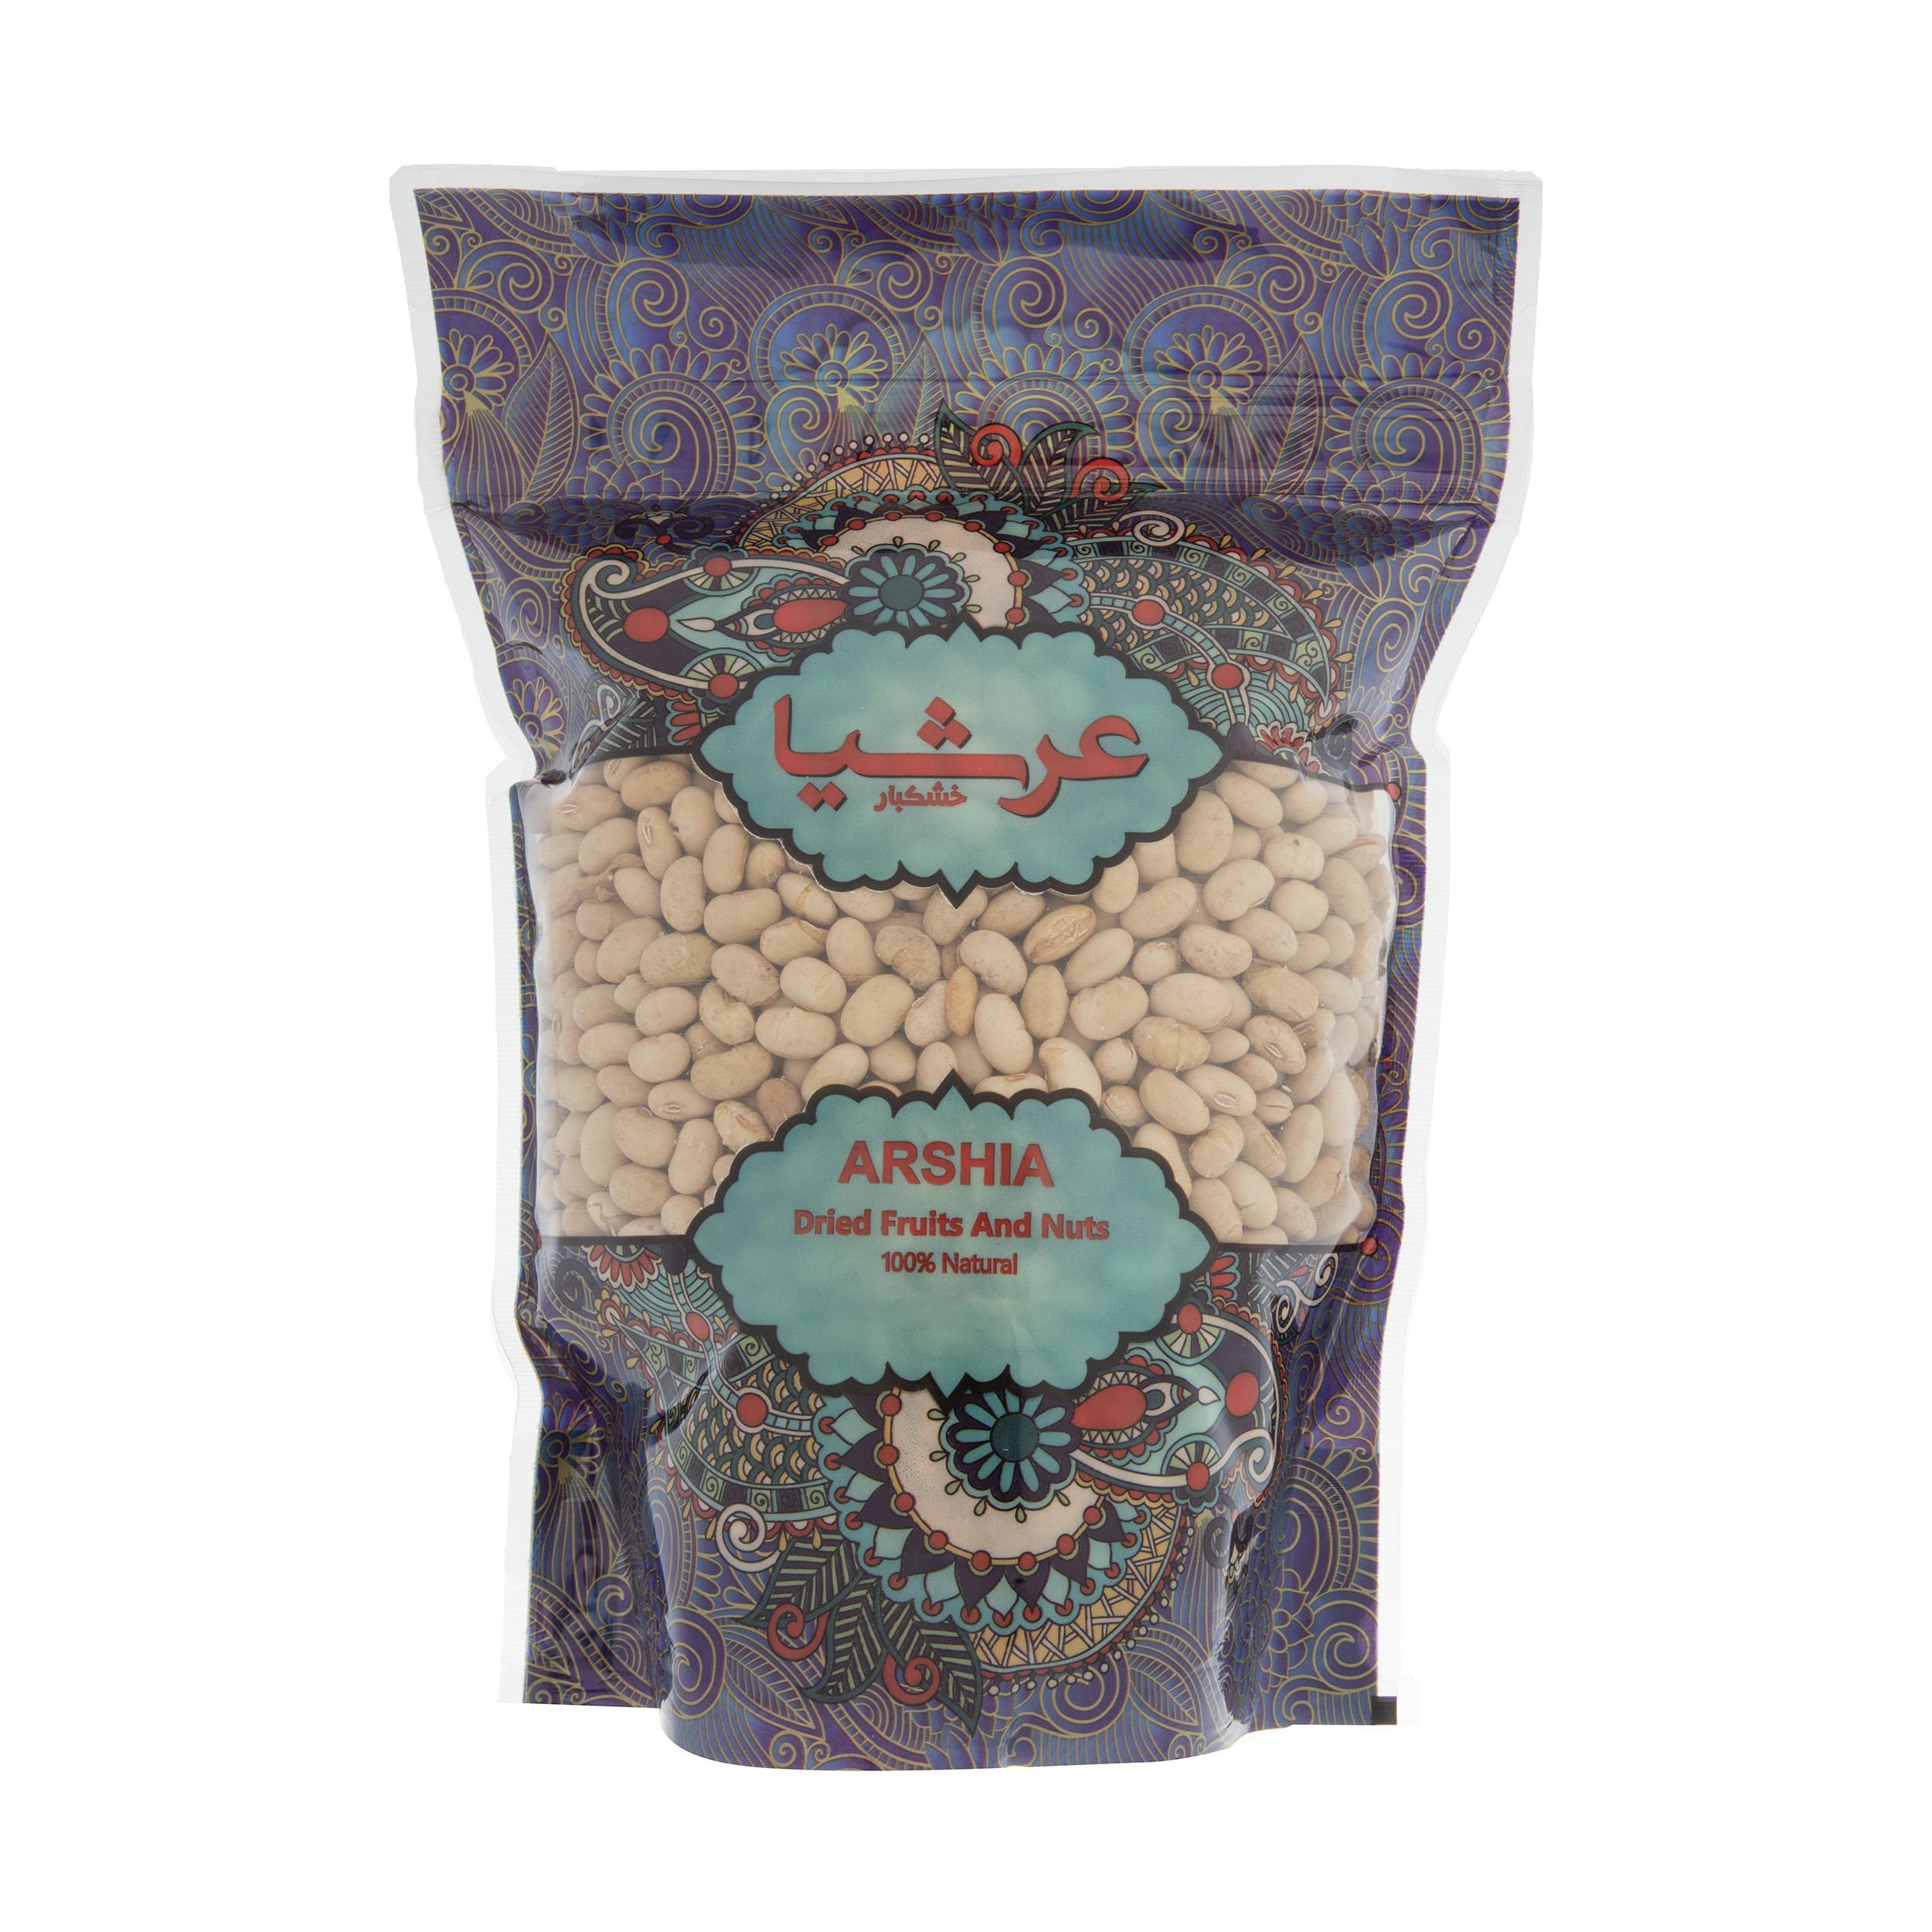 Arshia Soya 500 grams